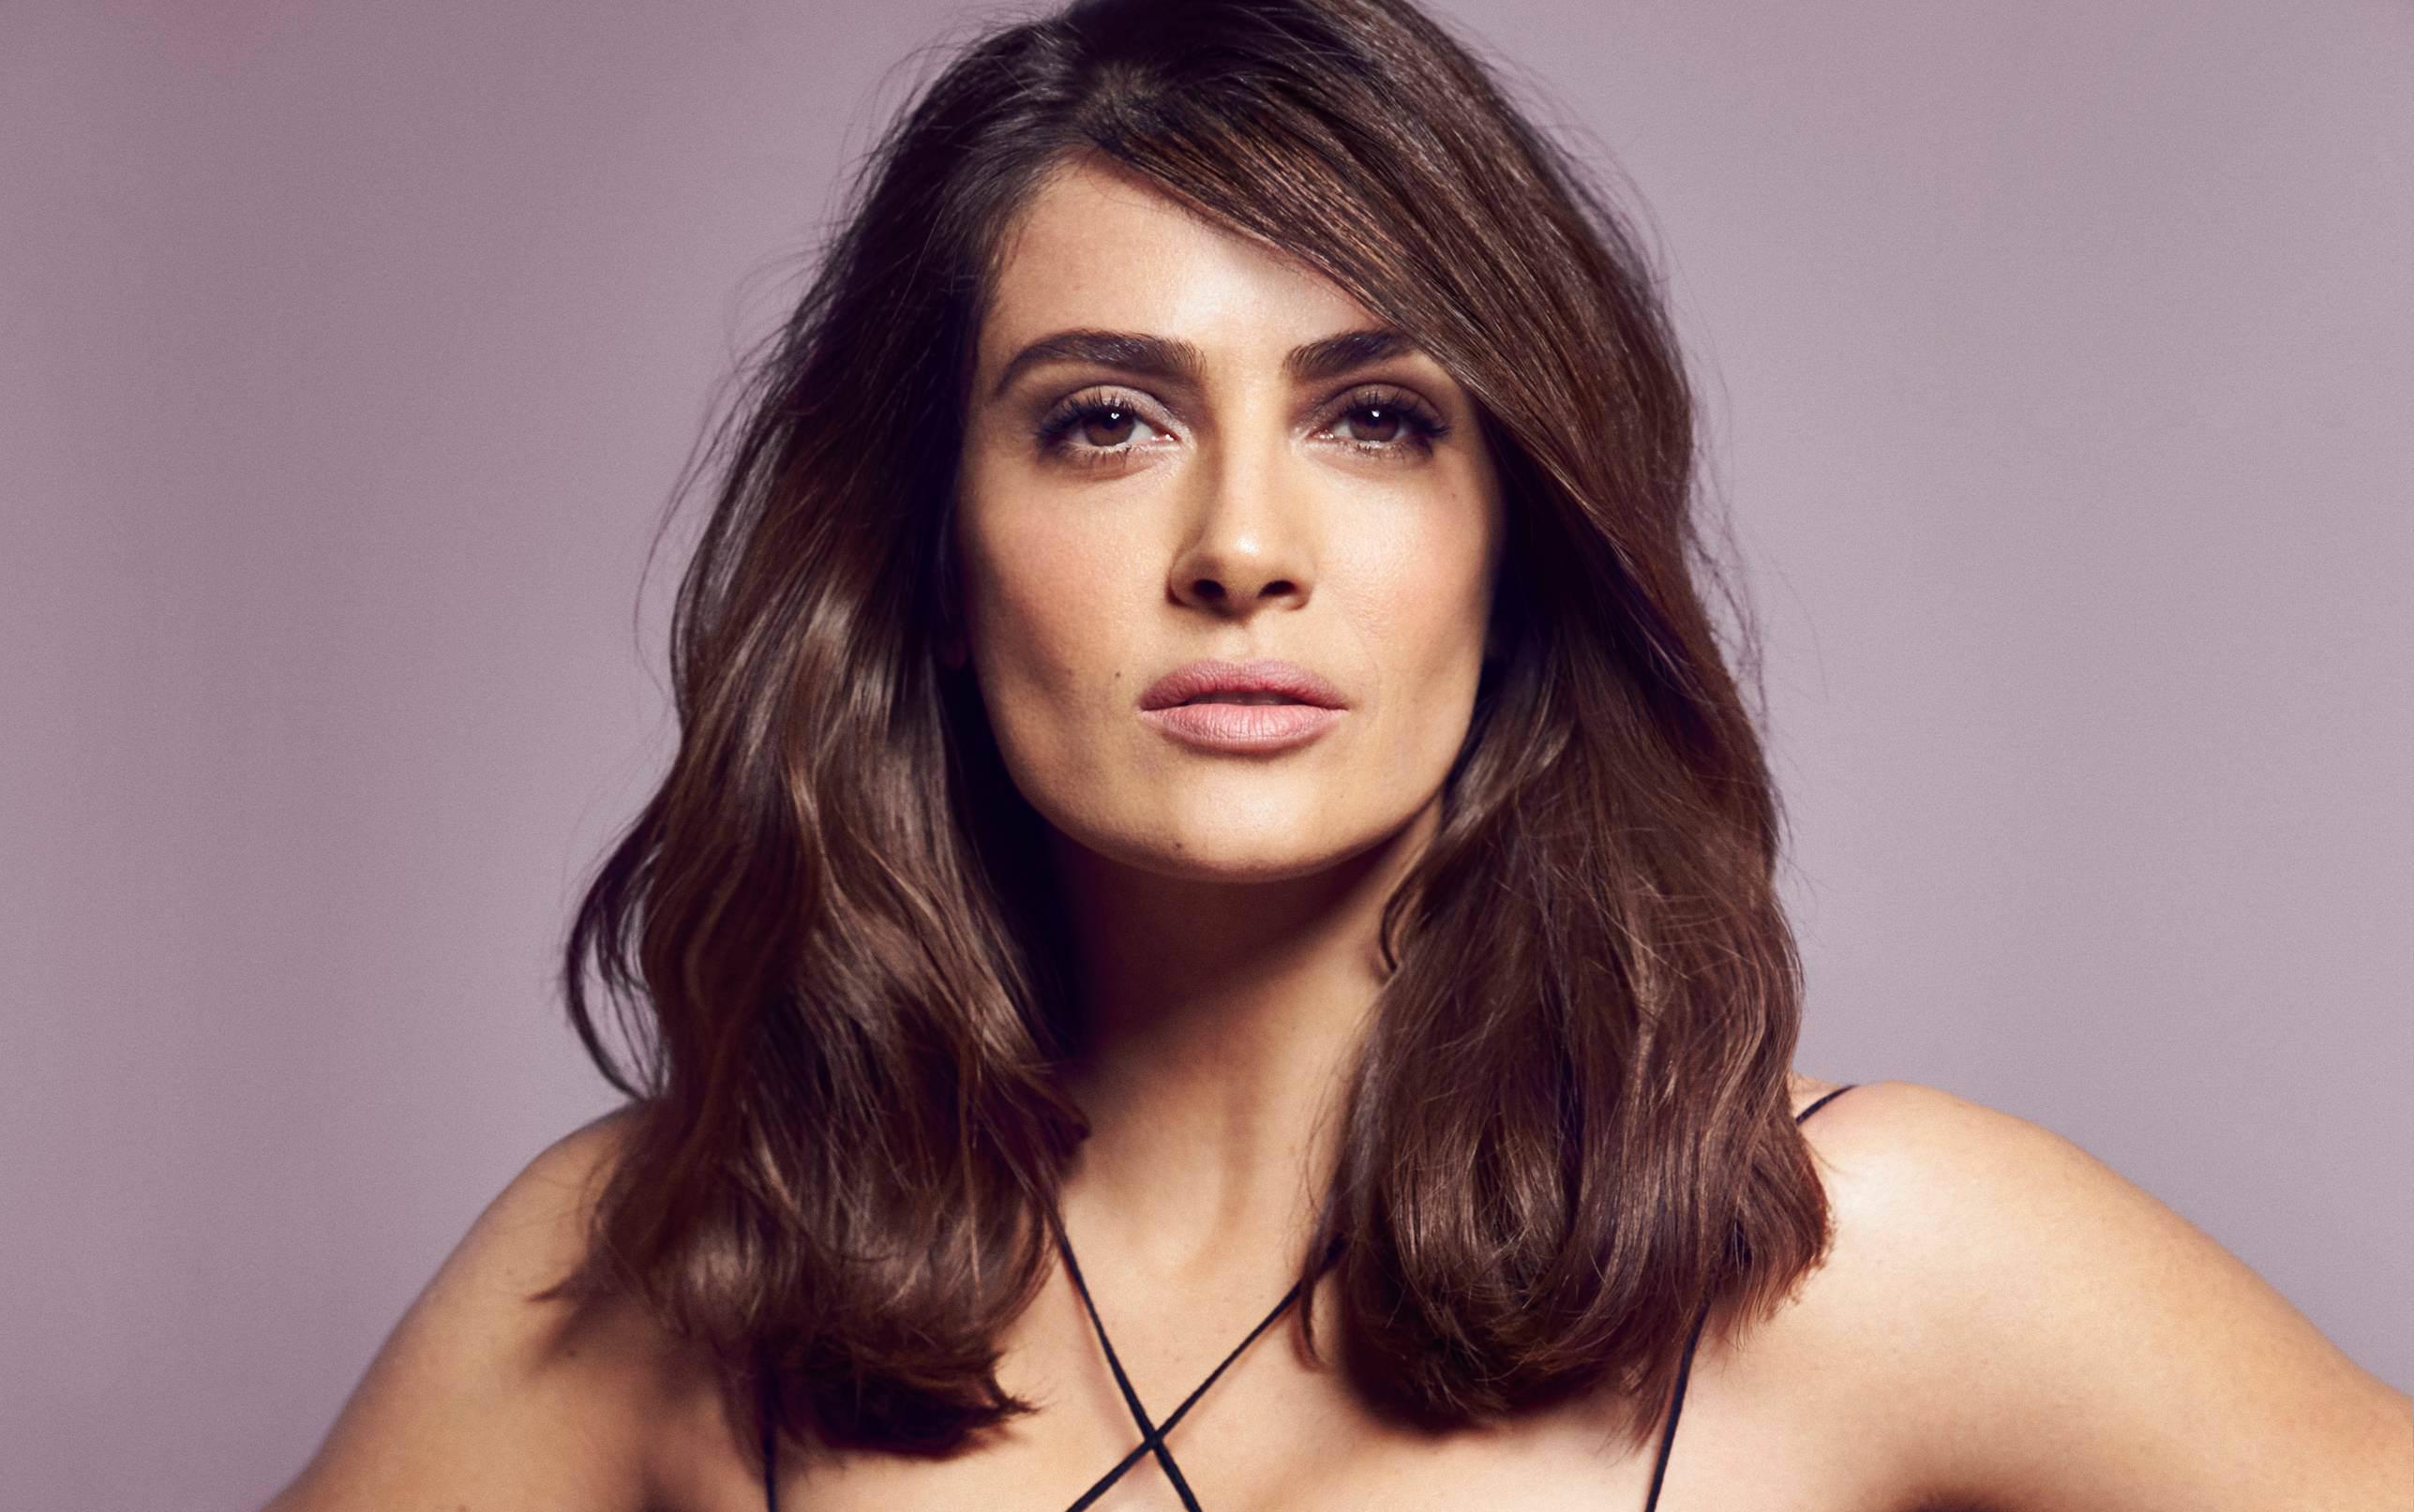 salma hayek 2018 hd celebrities 4k wallpapers images